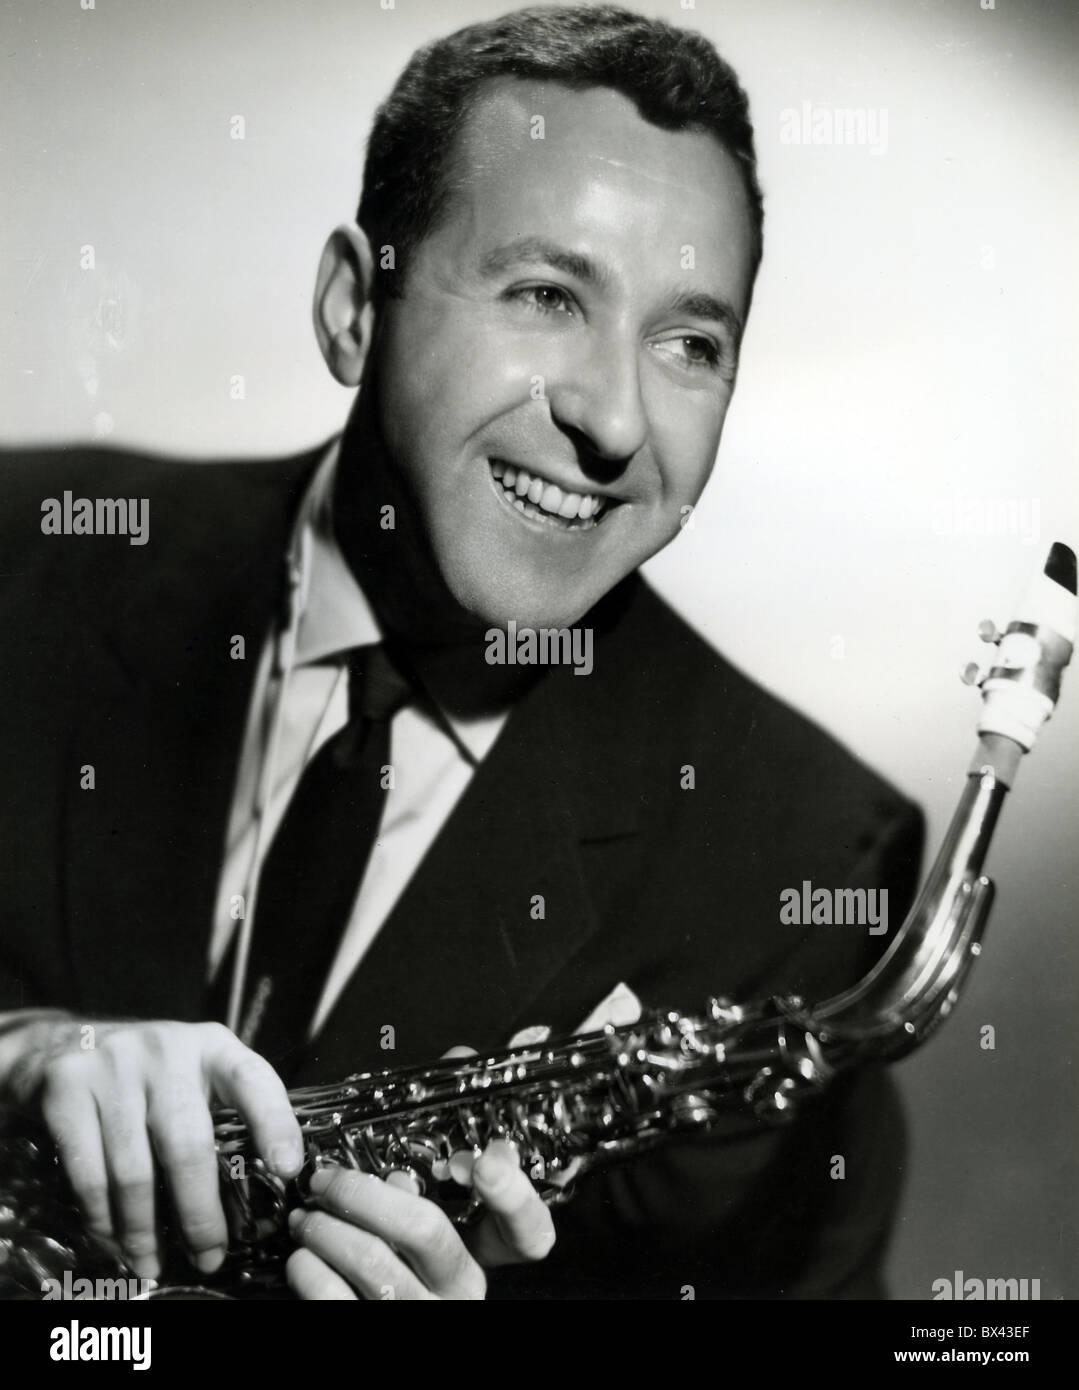 LENNY HAMBRO (1923-1995) US jazz musician ion 1957 with his Martin 'Magna' Alto Sax and Brilhart  'Tonalin' - Stock Image